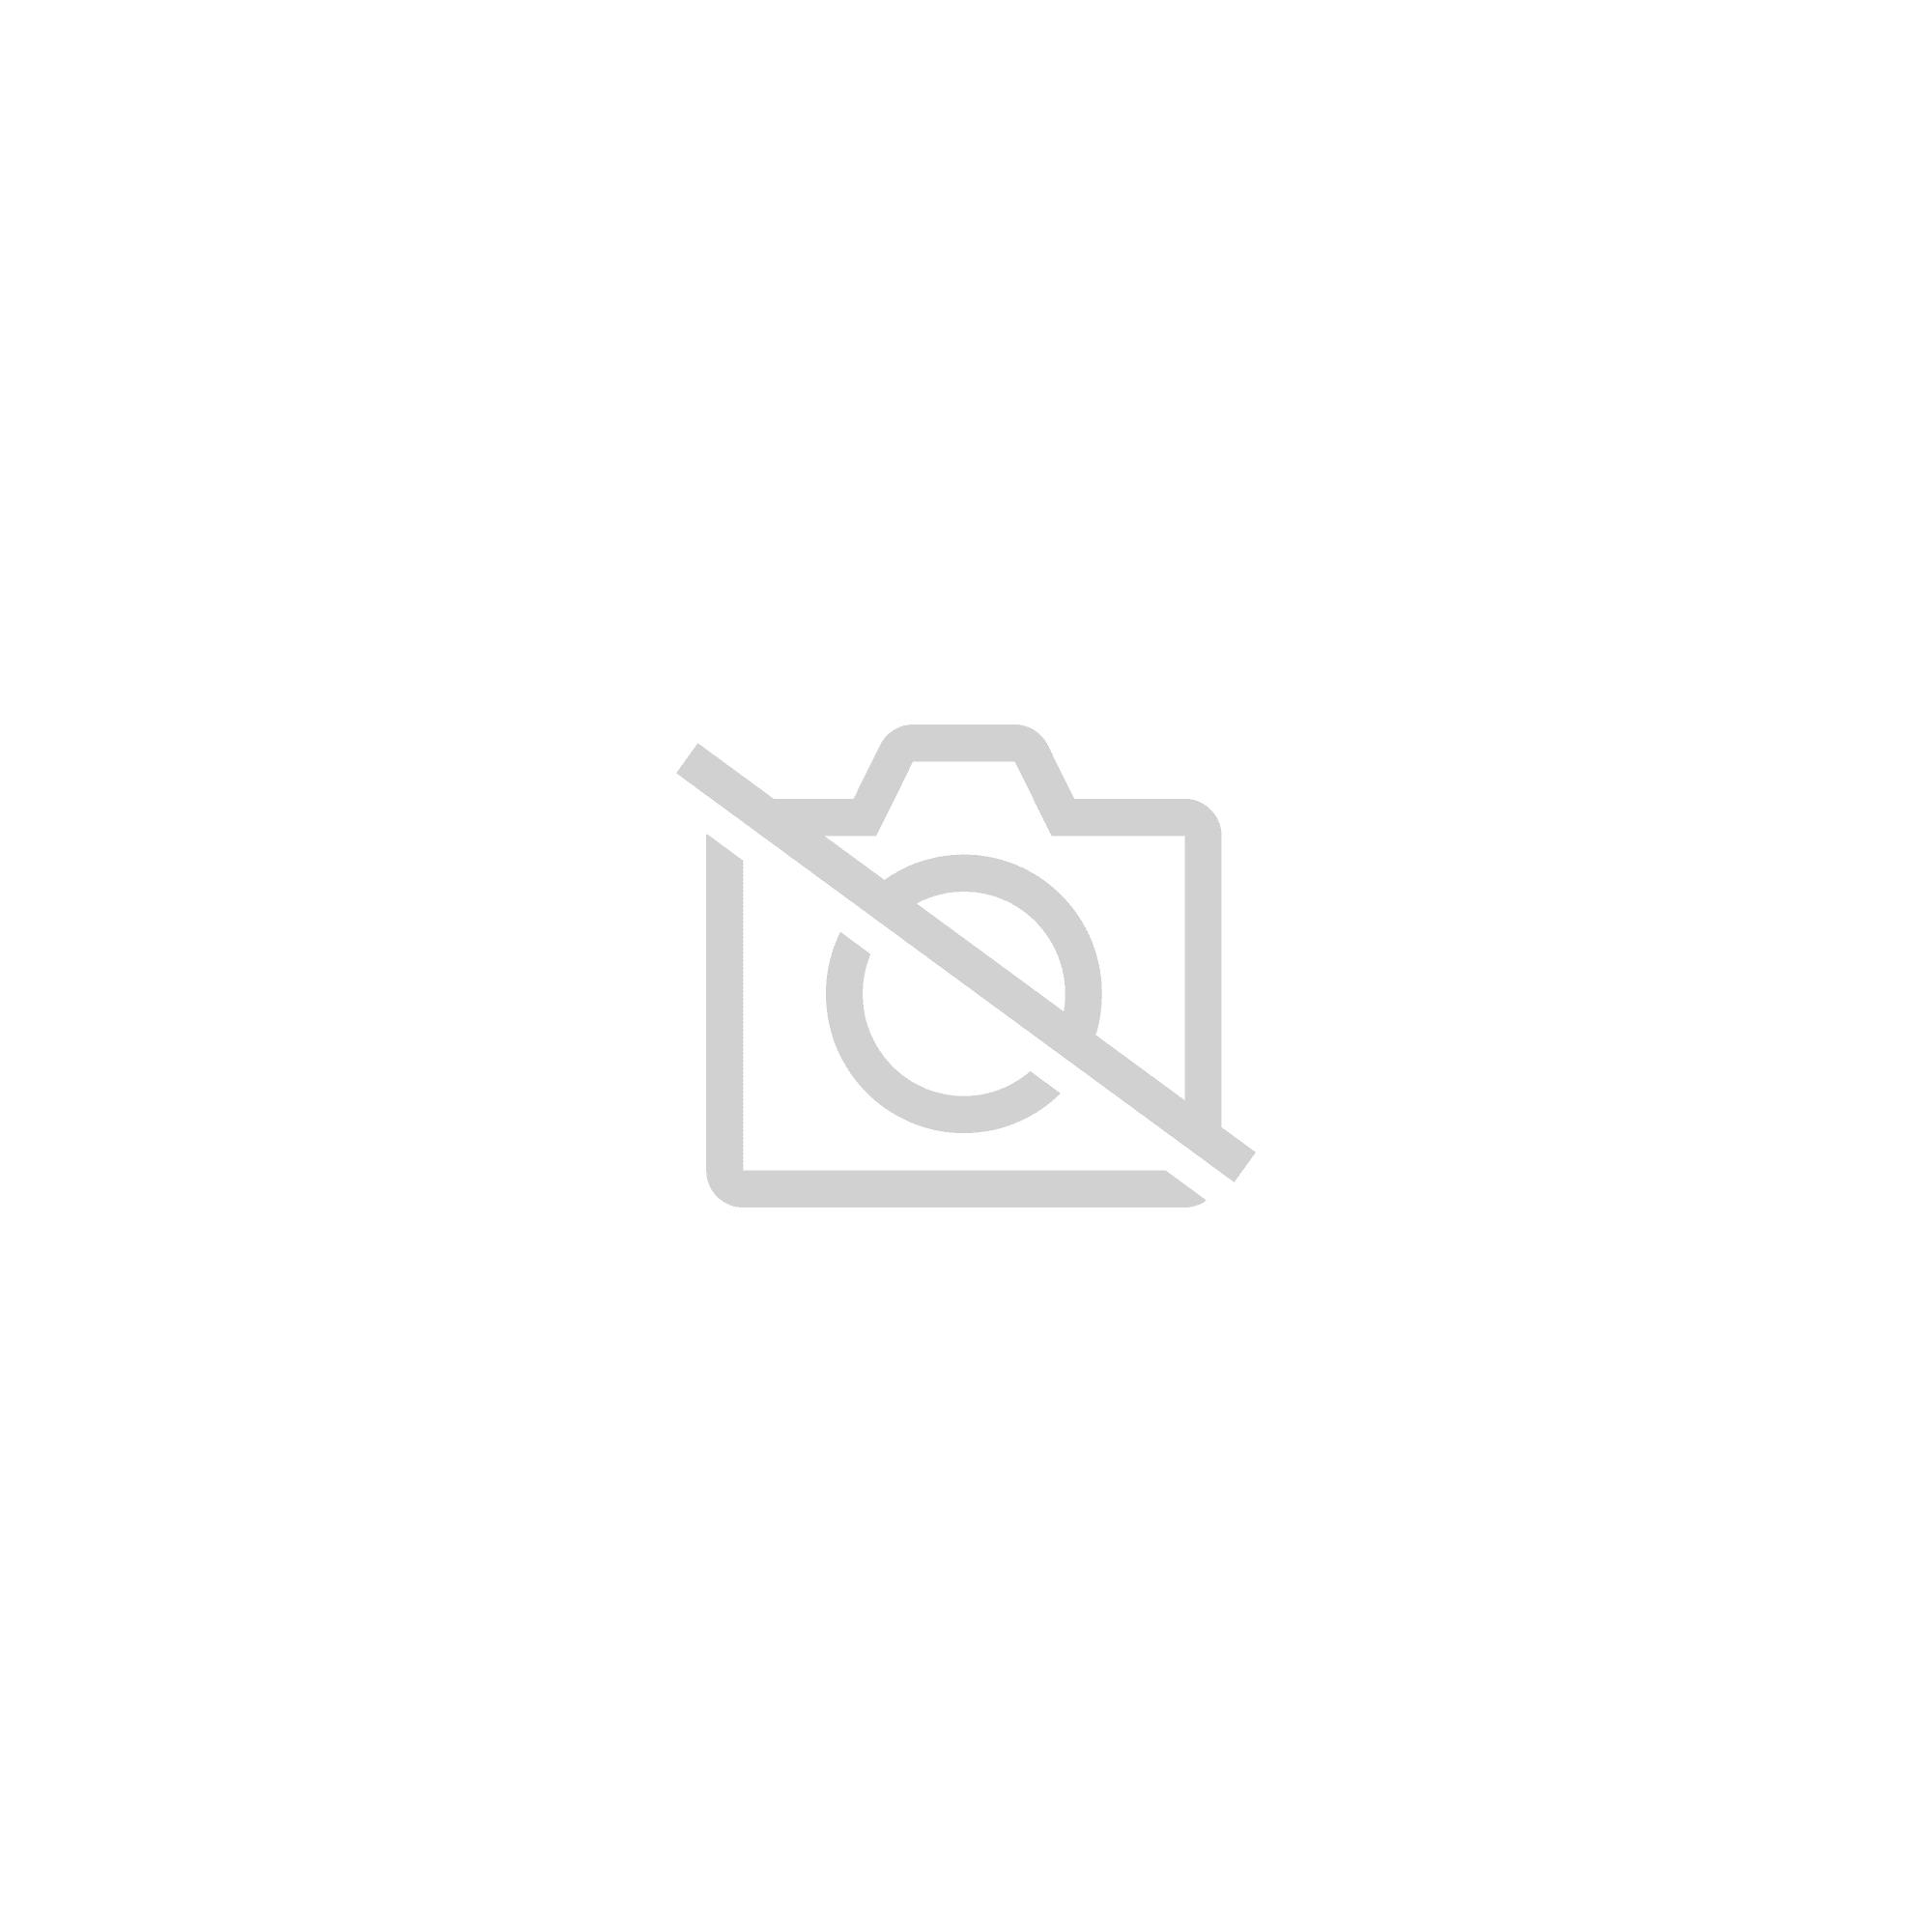 a6acf8ca188917 lunettes oakley holbrook noir